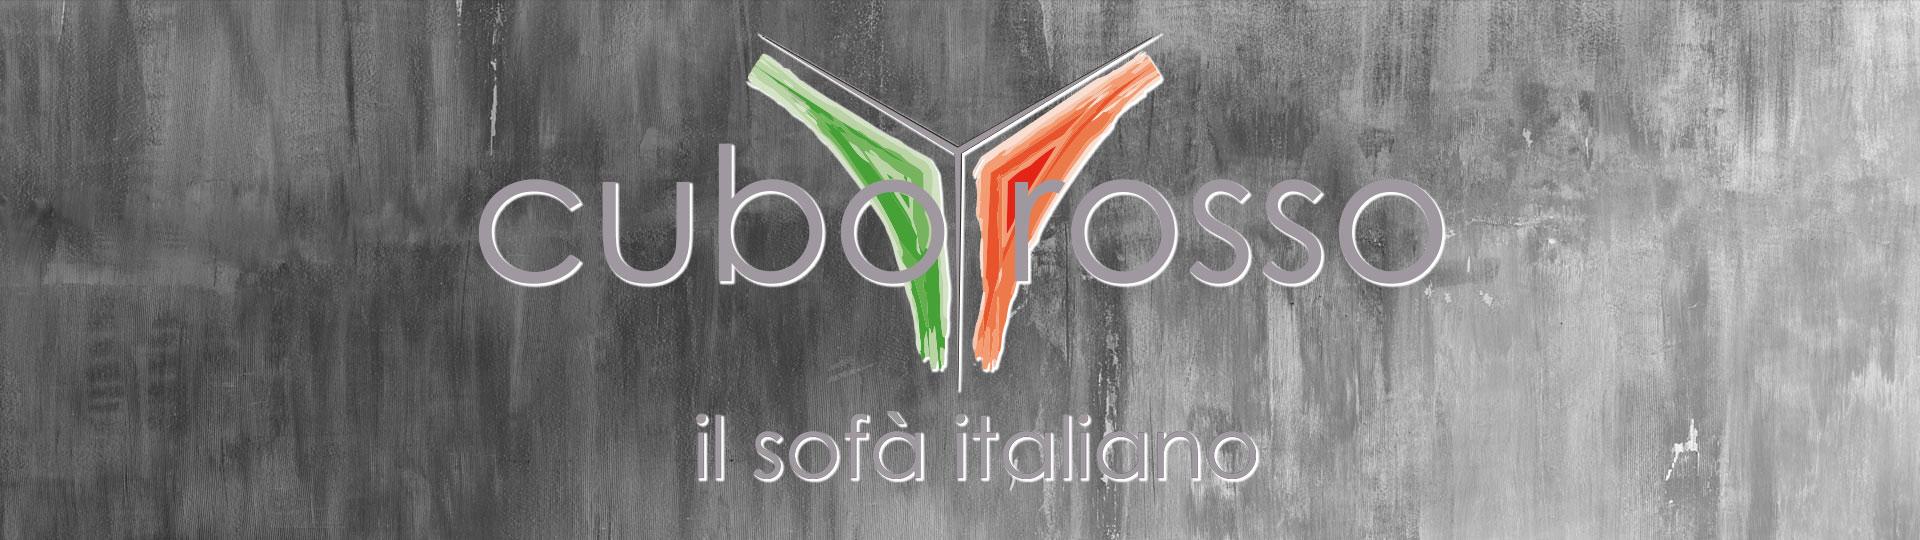 Mobili-Franco-Blog-Cubo-Rosso